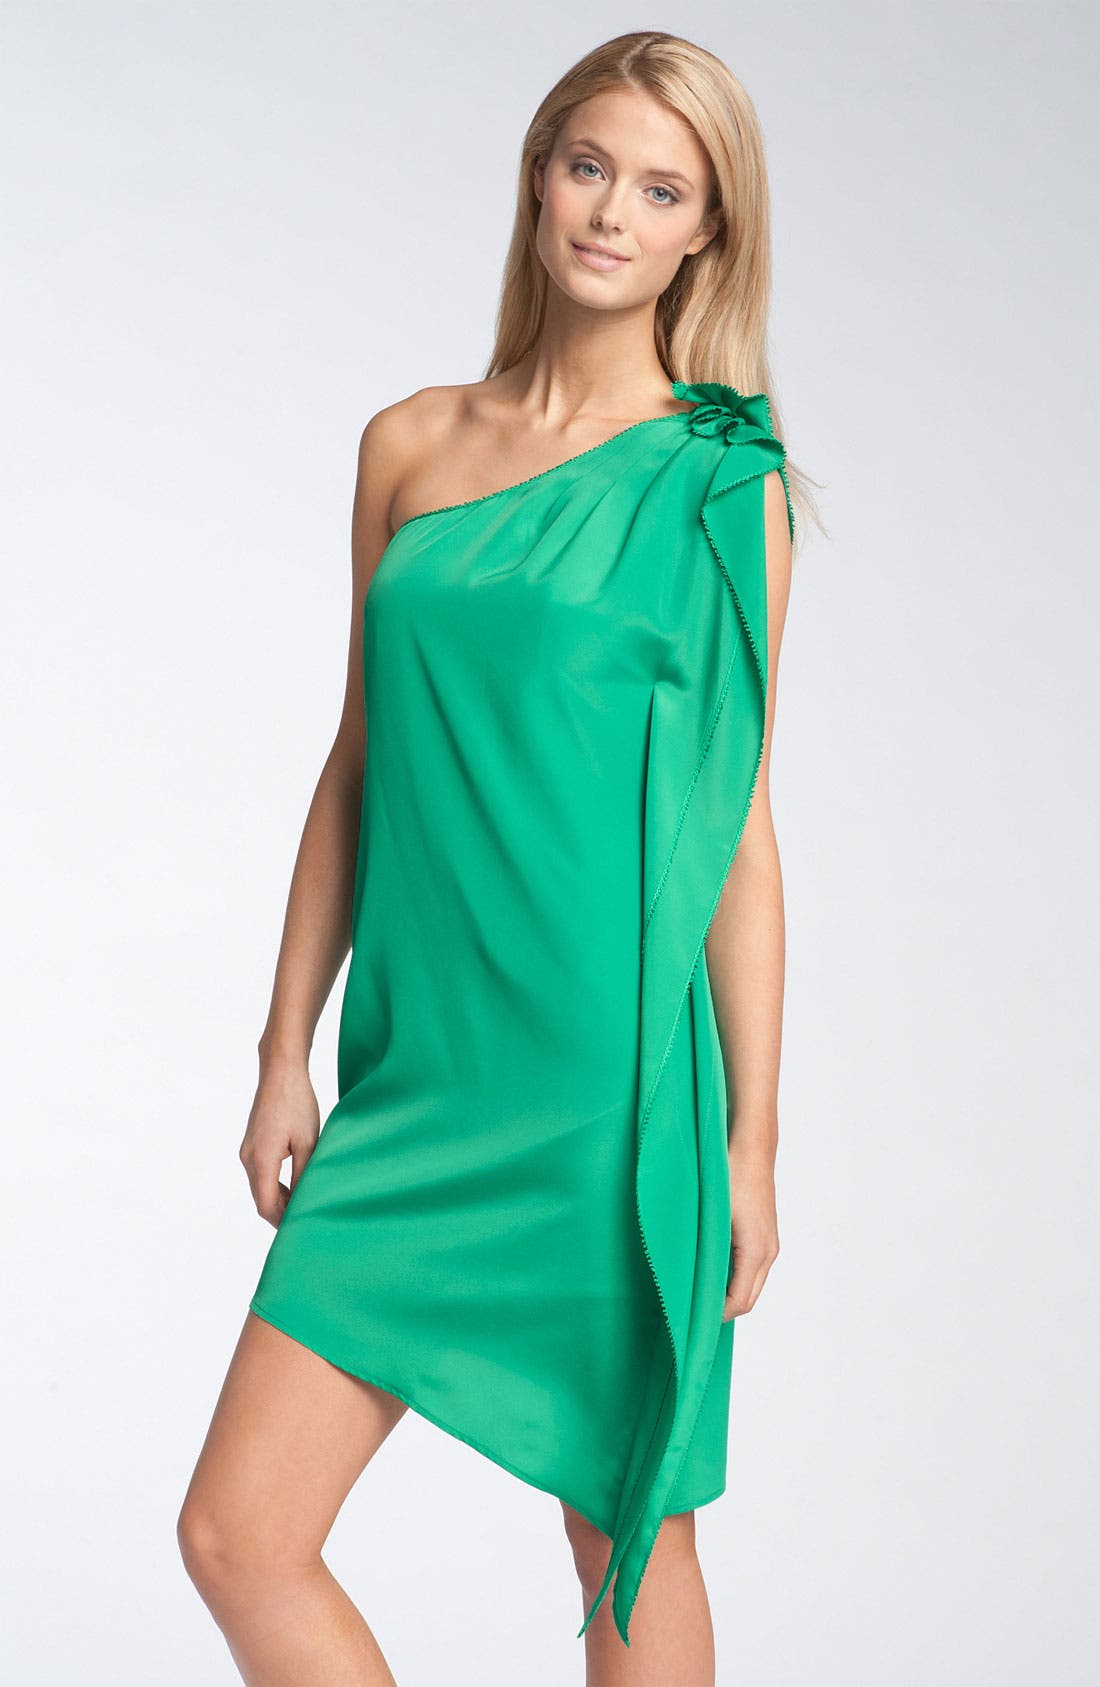 Alternate Image 1 Selected - Jessica Simpson One Shoulder Ruffle Dress